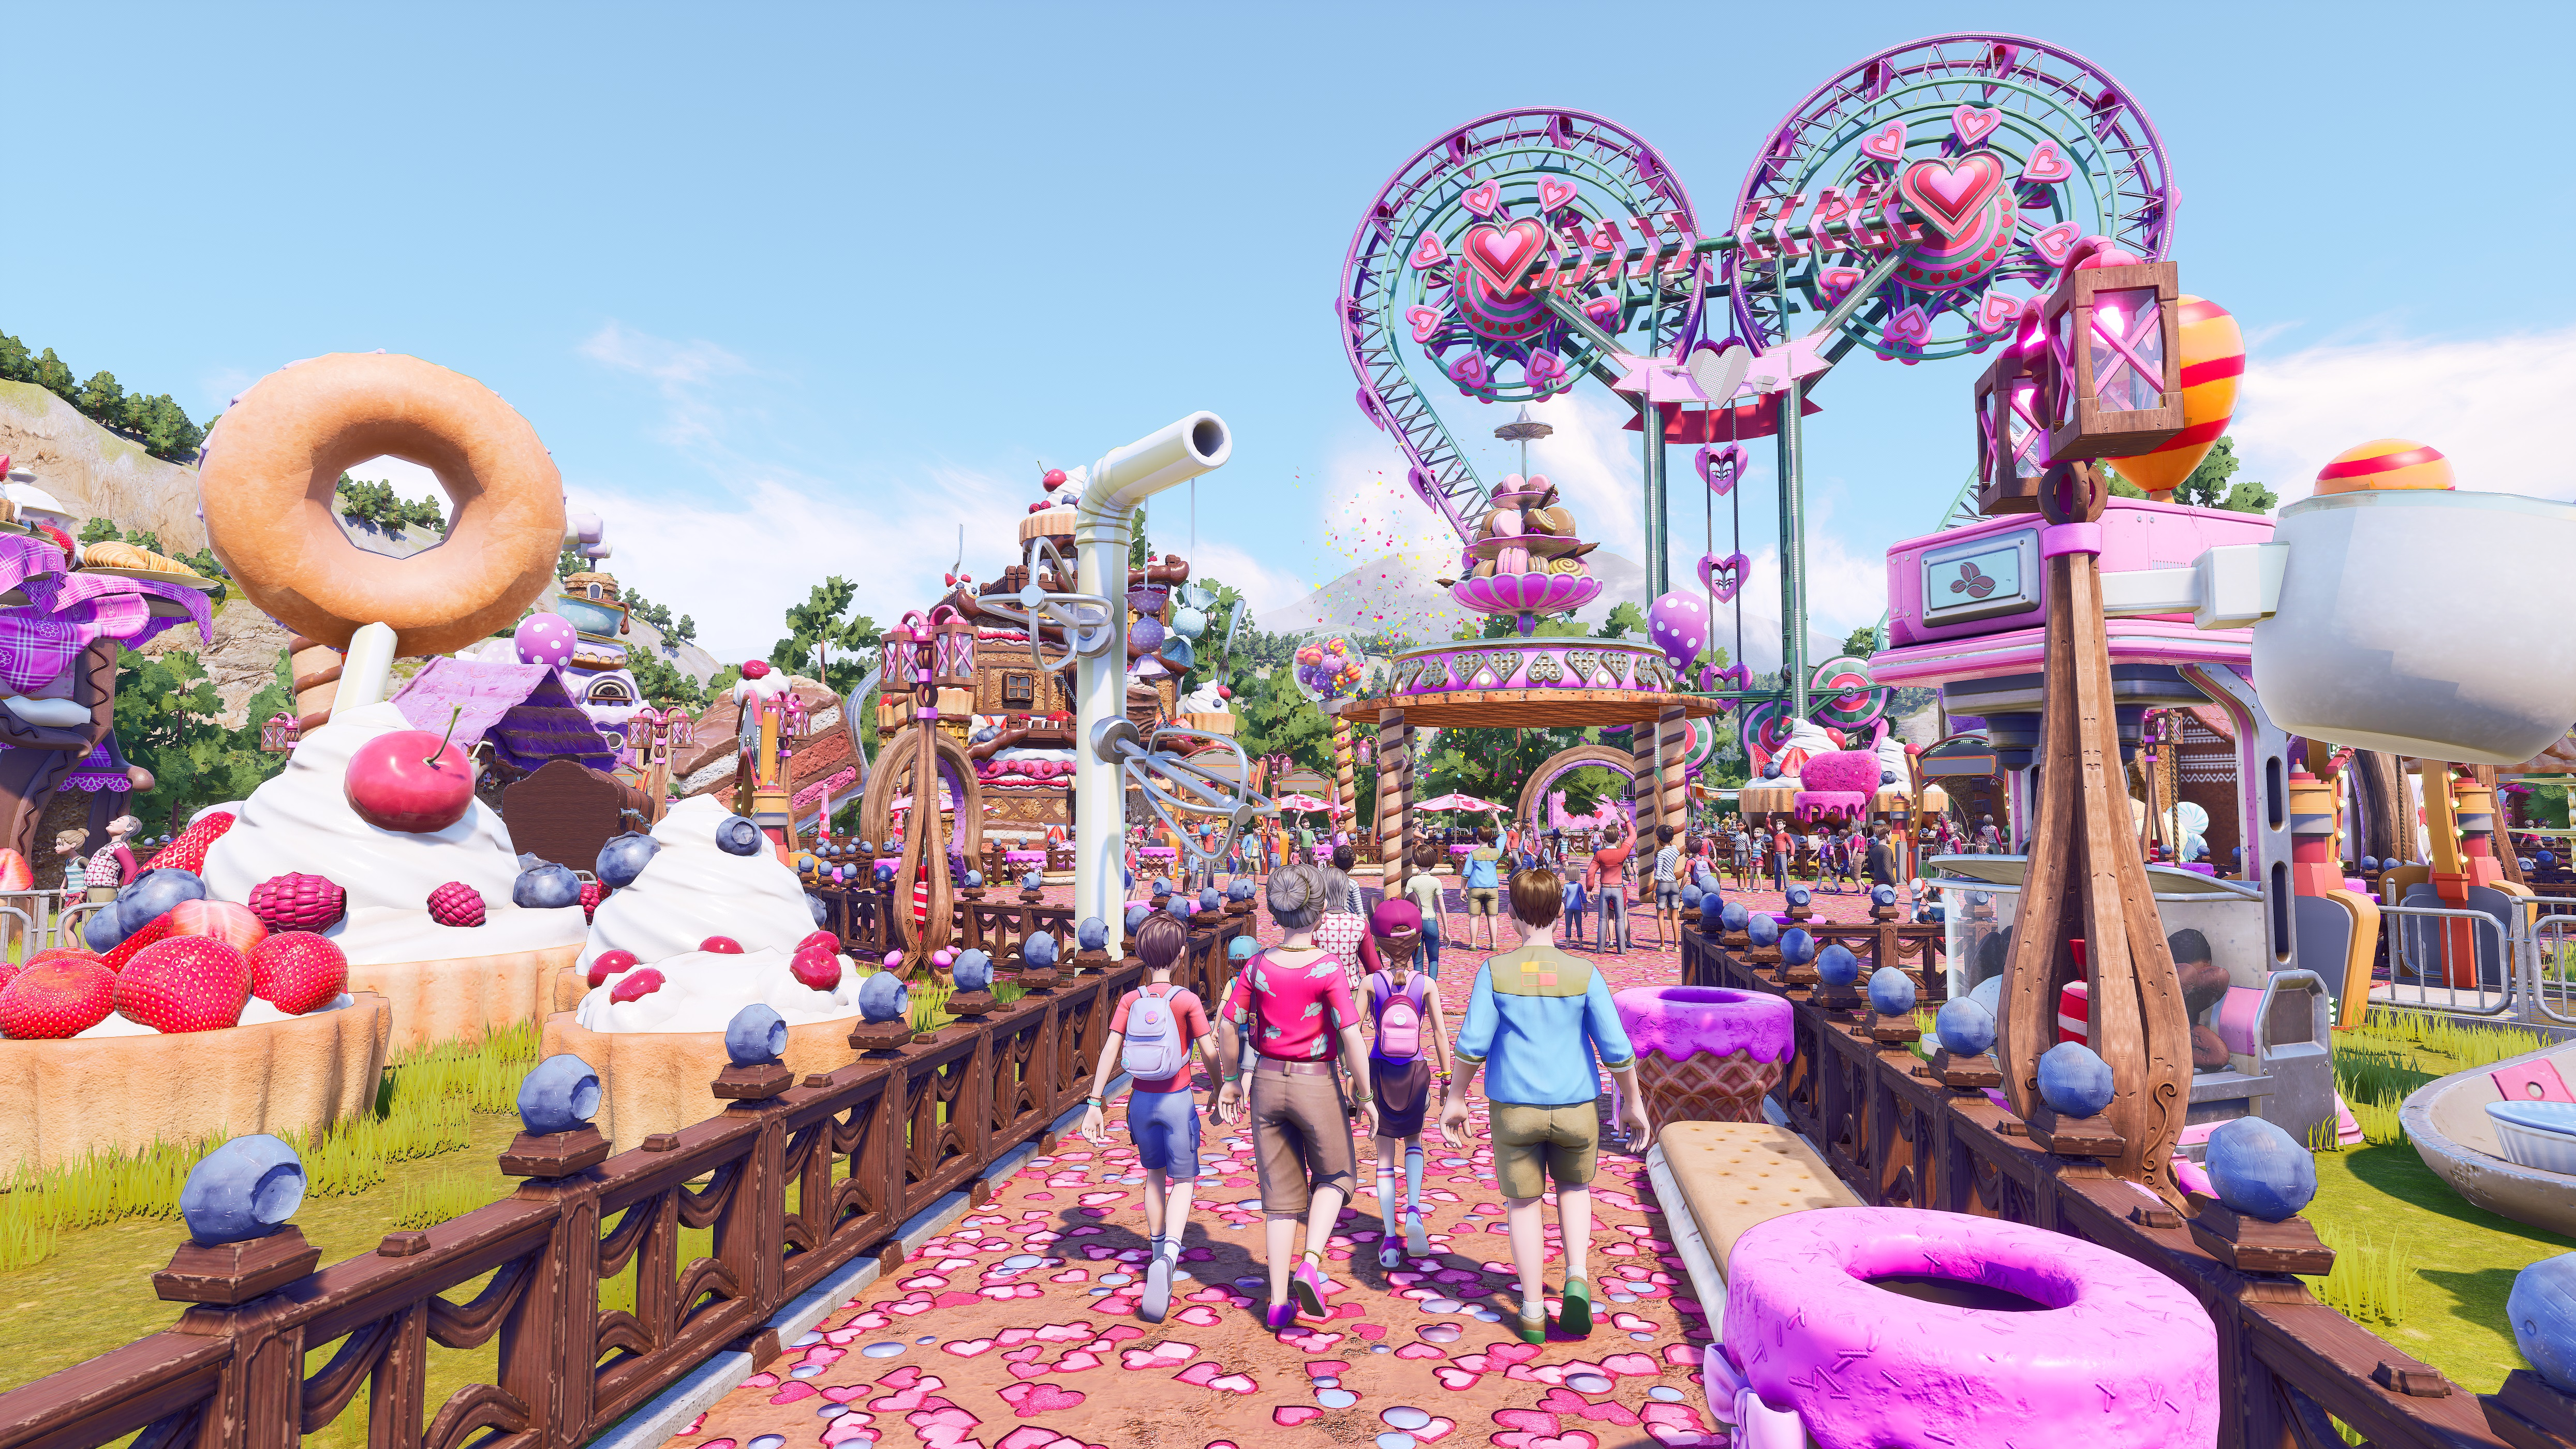 A Candyland-themed park